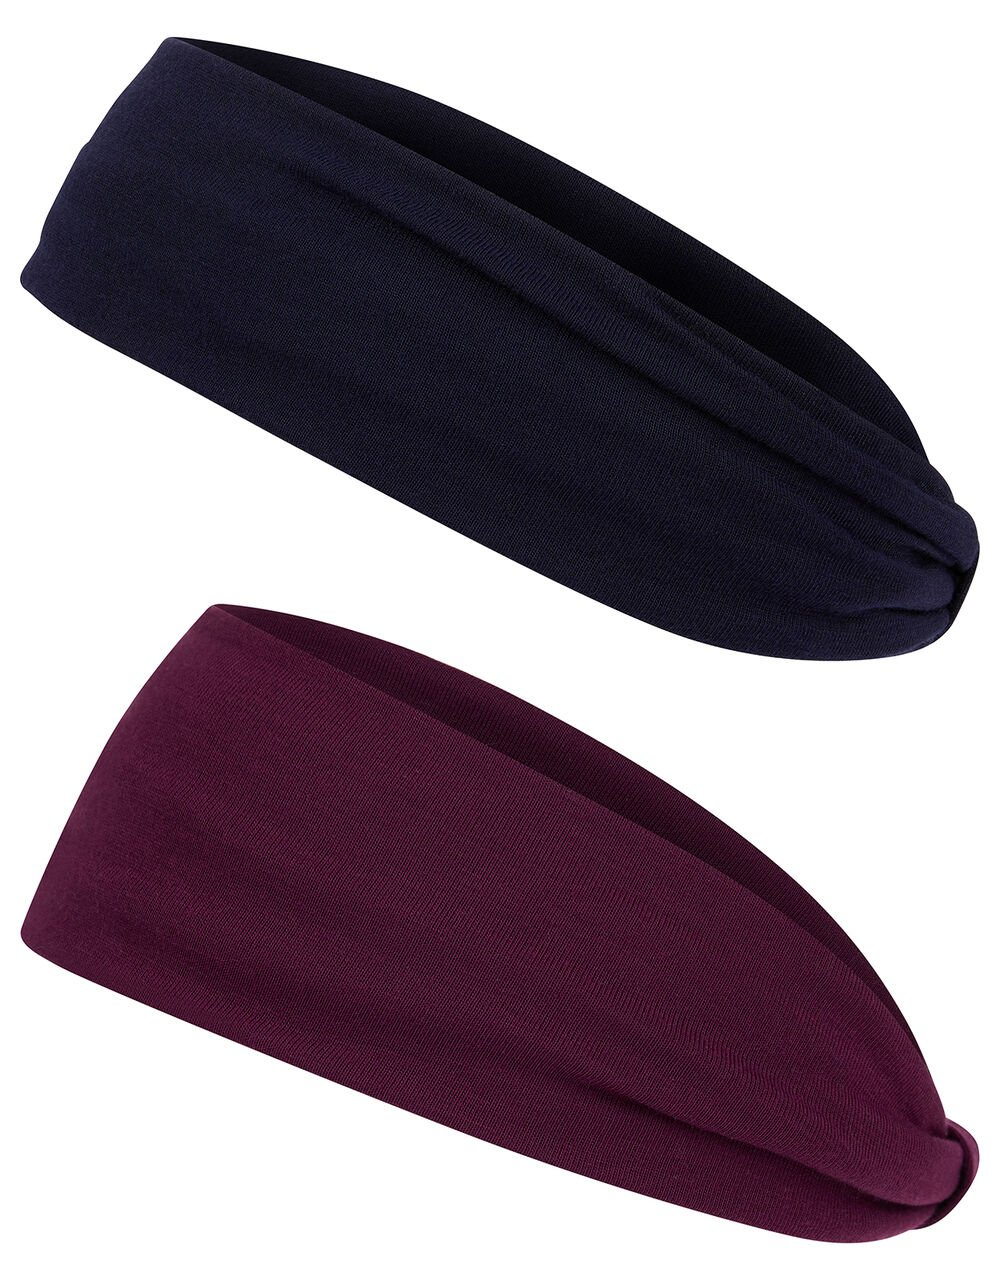 Plain Jersey Bando Headband Set, , large